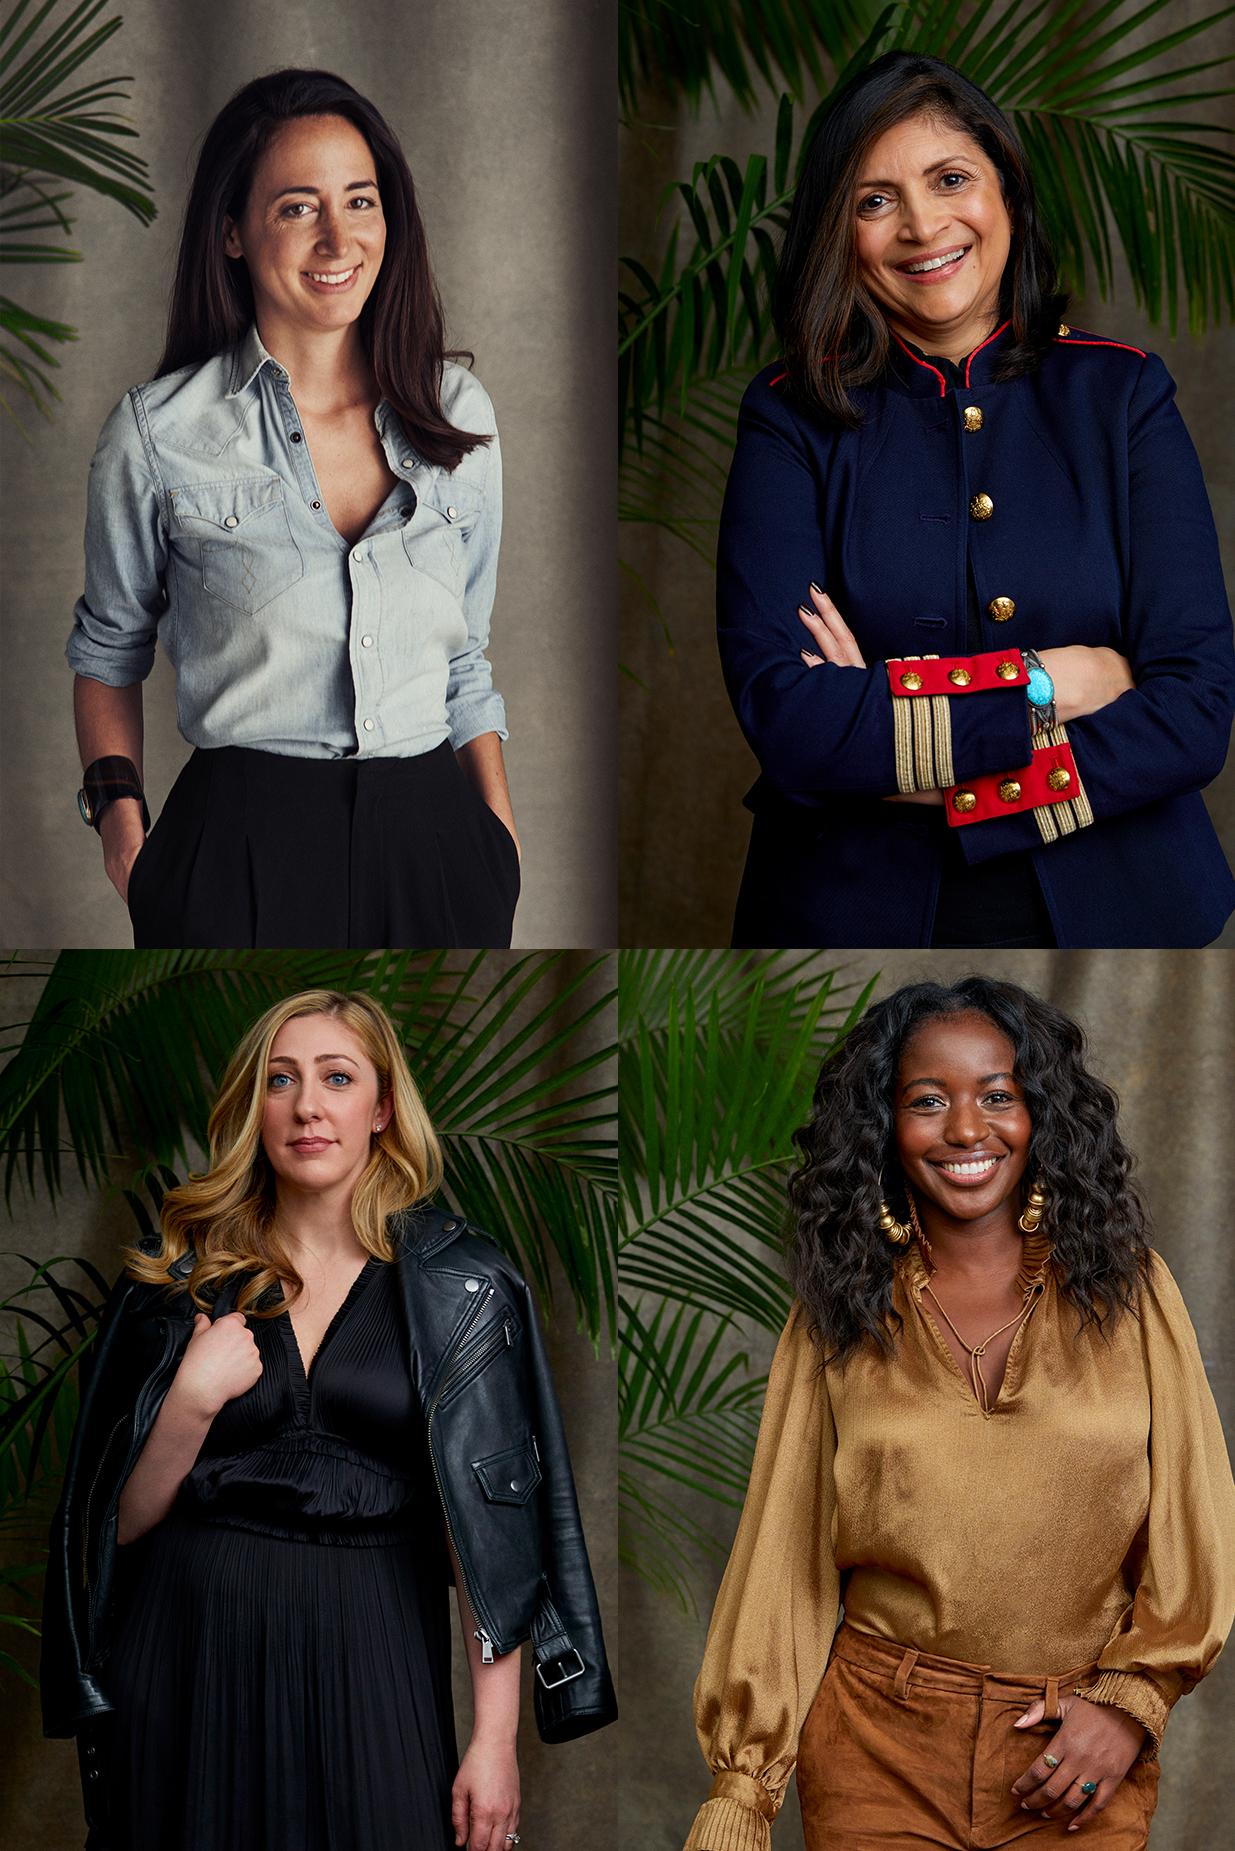 Ralph Lauren International Women's Day Campaign images of women